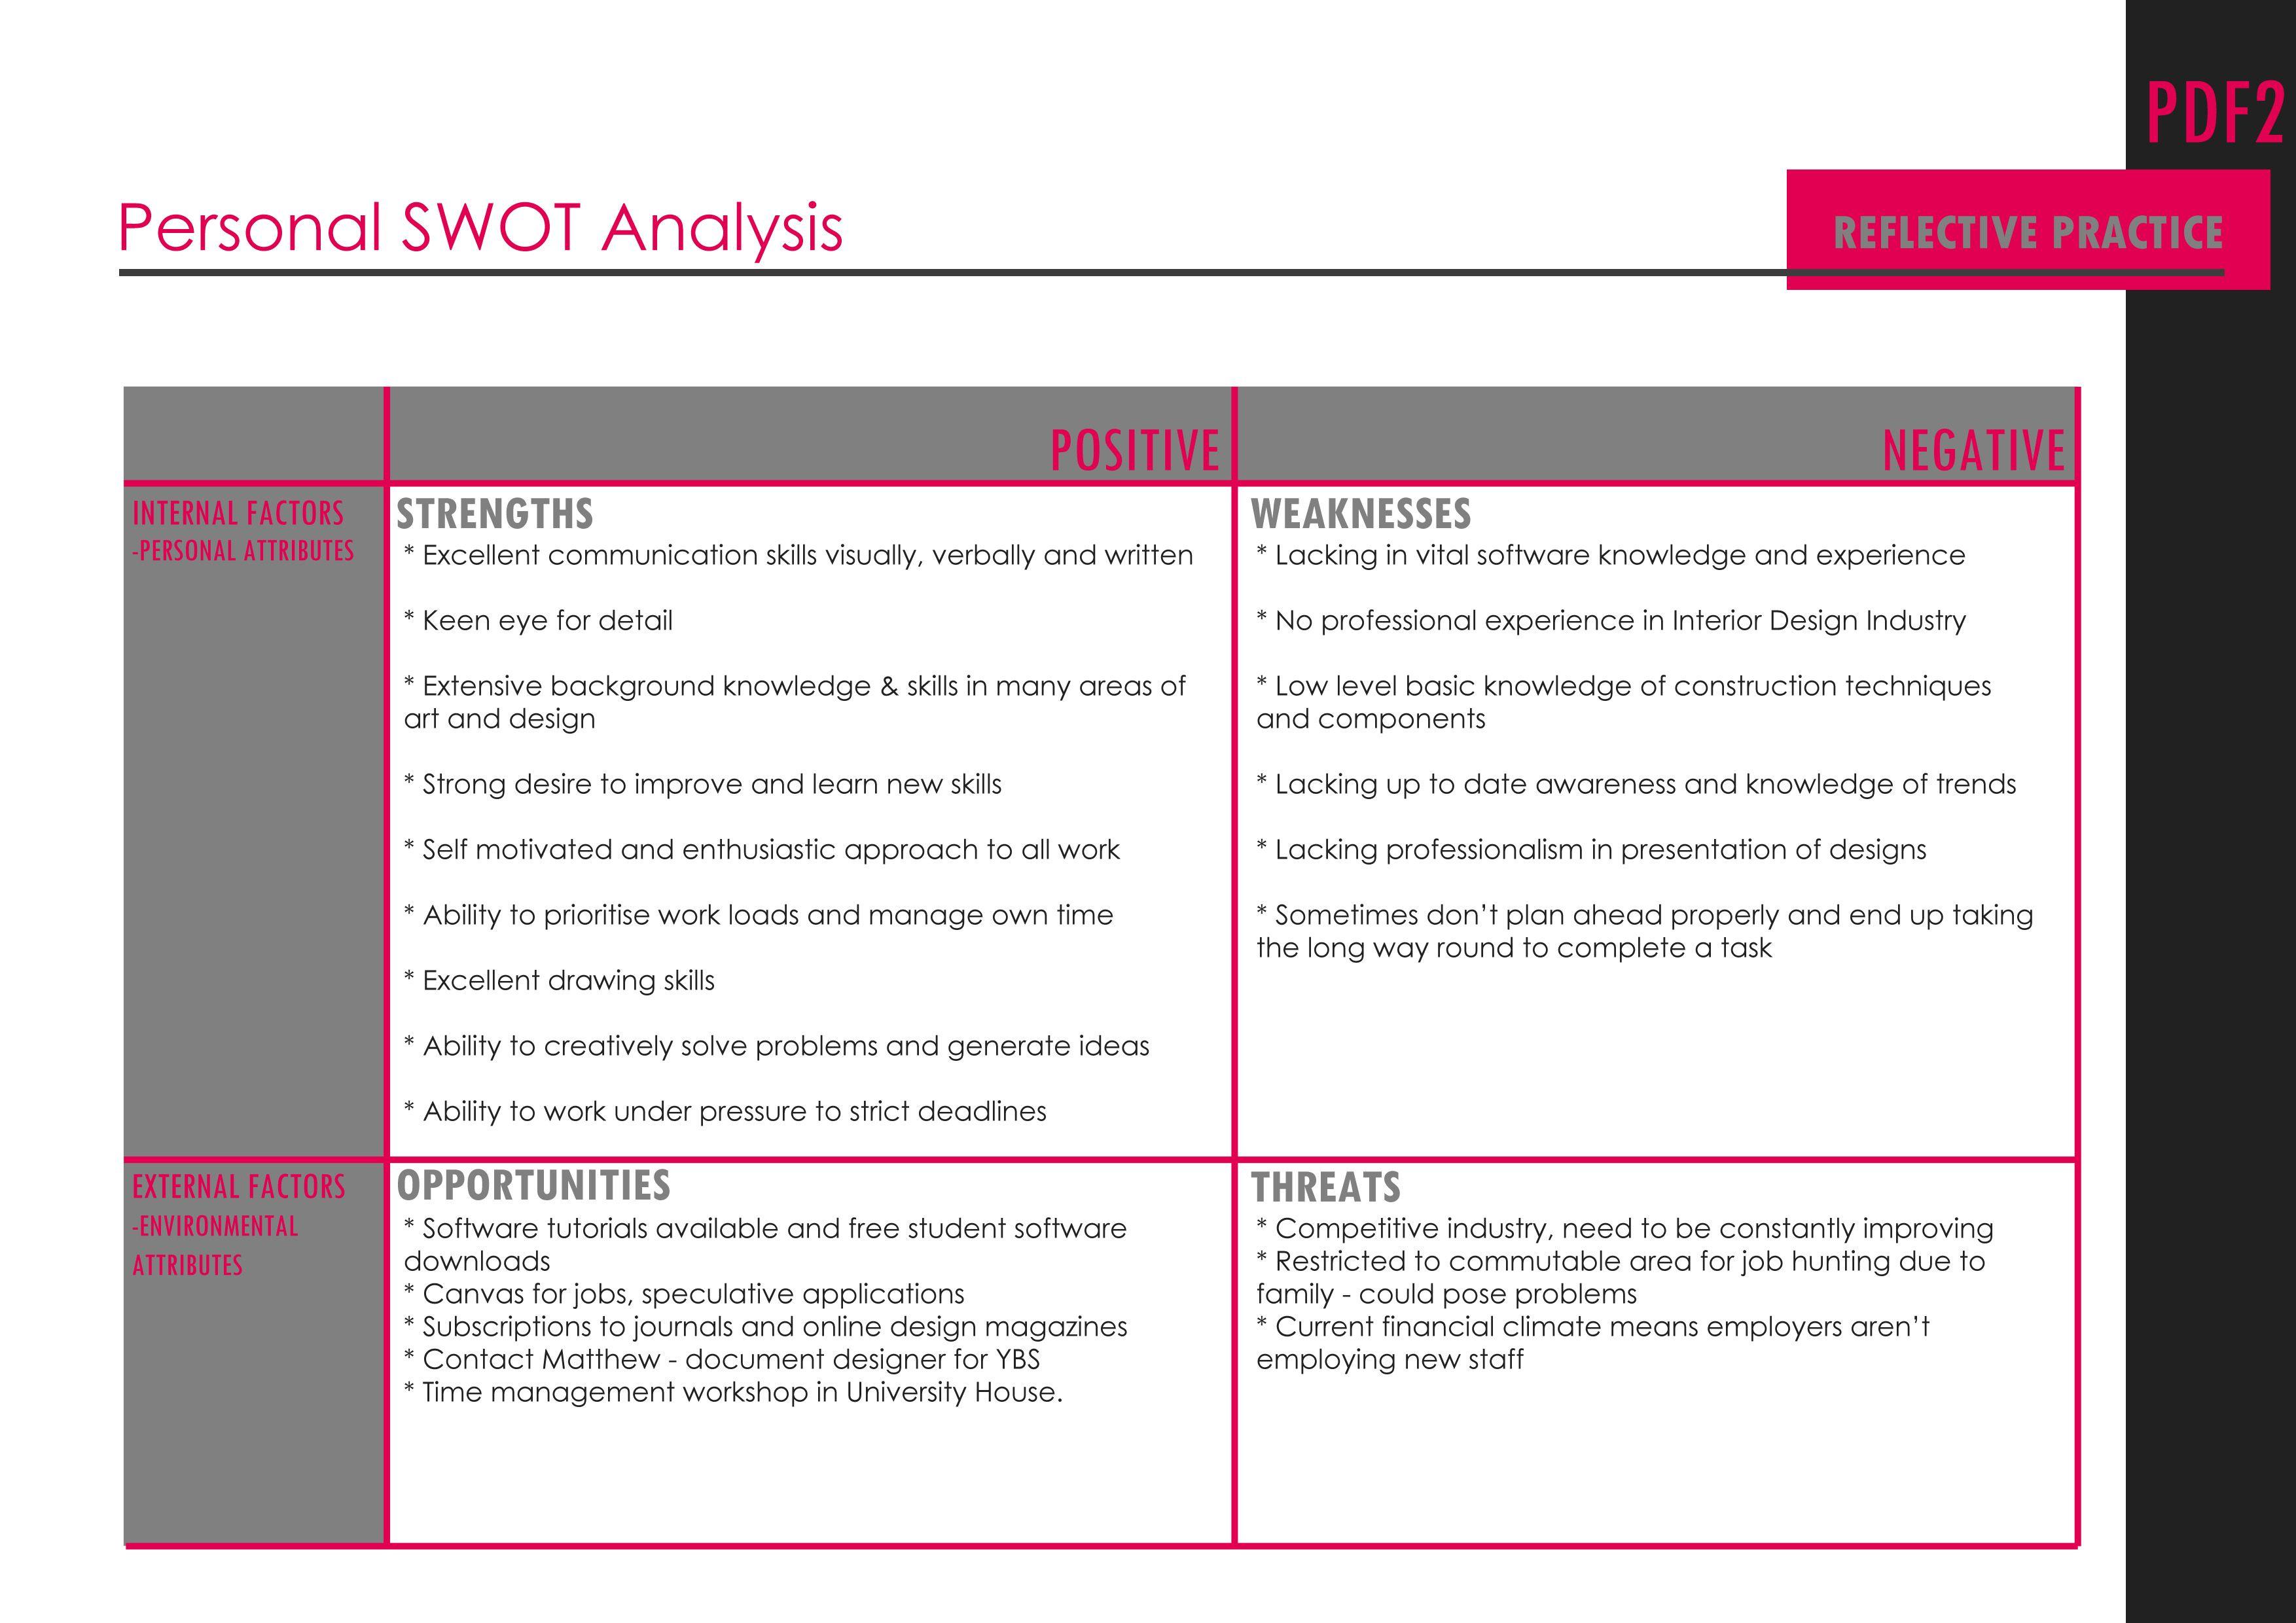 Personal swot analysis for interior design via kaylee jade design life coaching pinterest for Interior design study material pdf